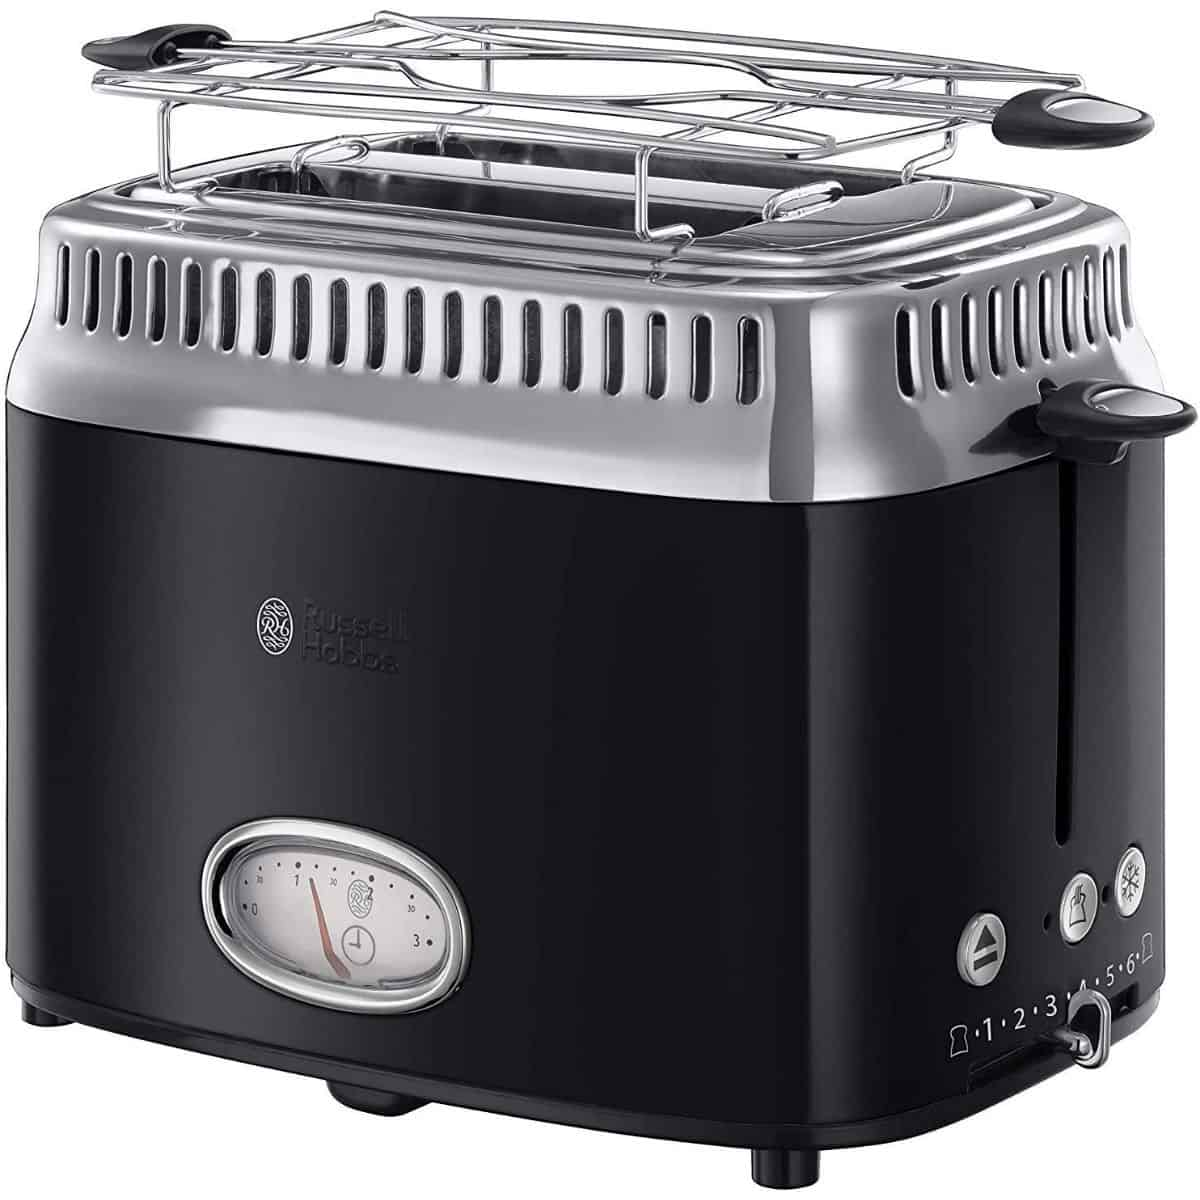 Russell Hobbs 21681-56 Retro Toaster